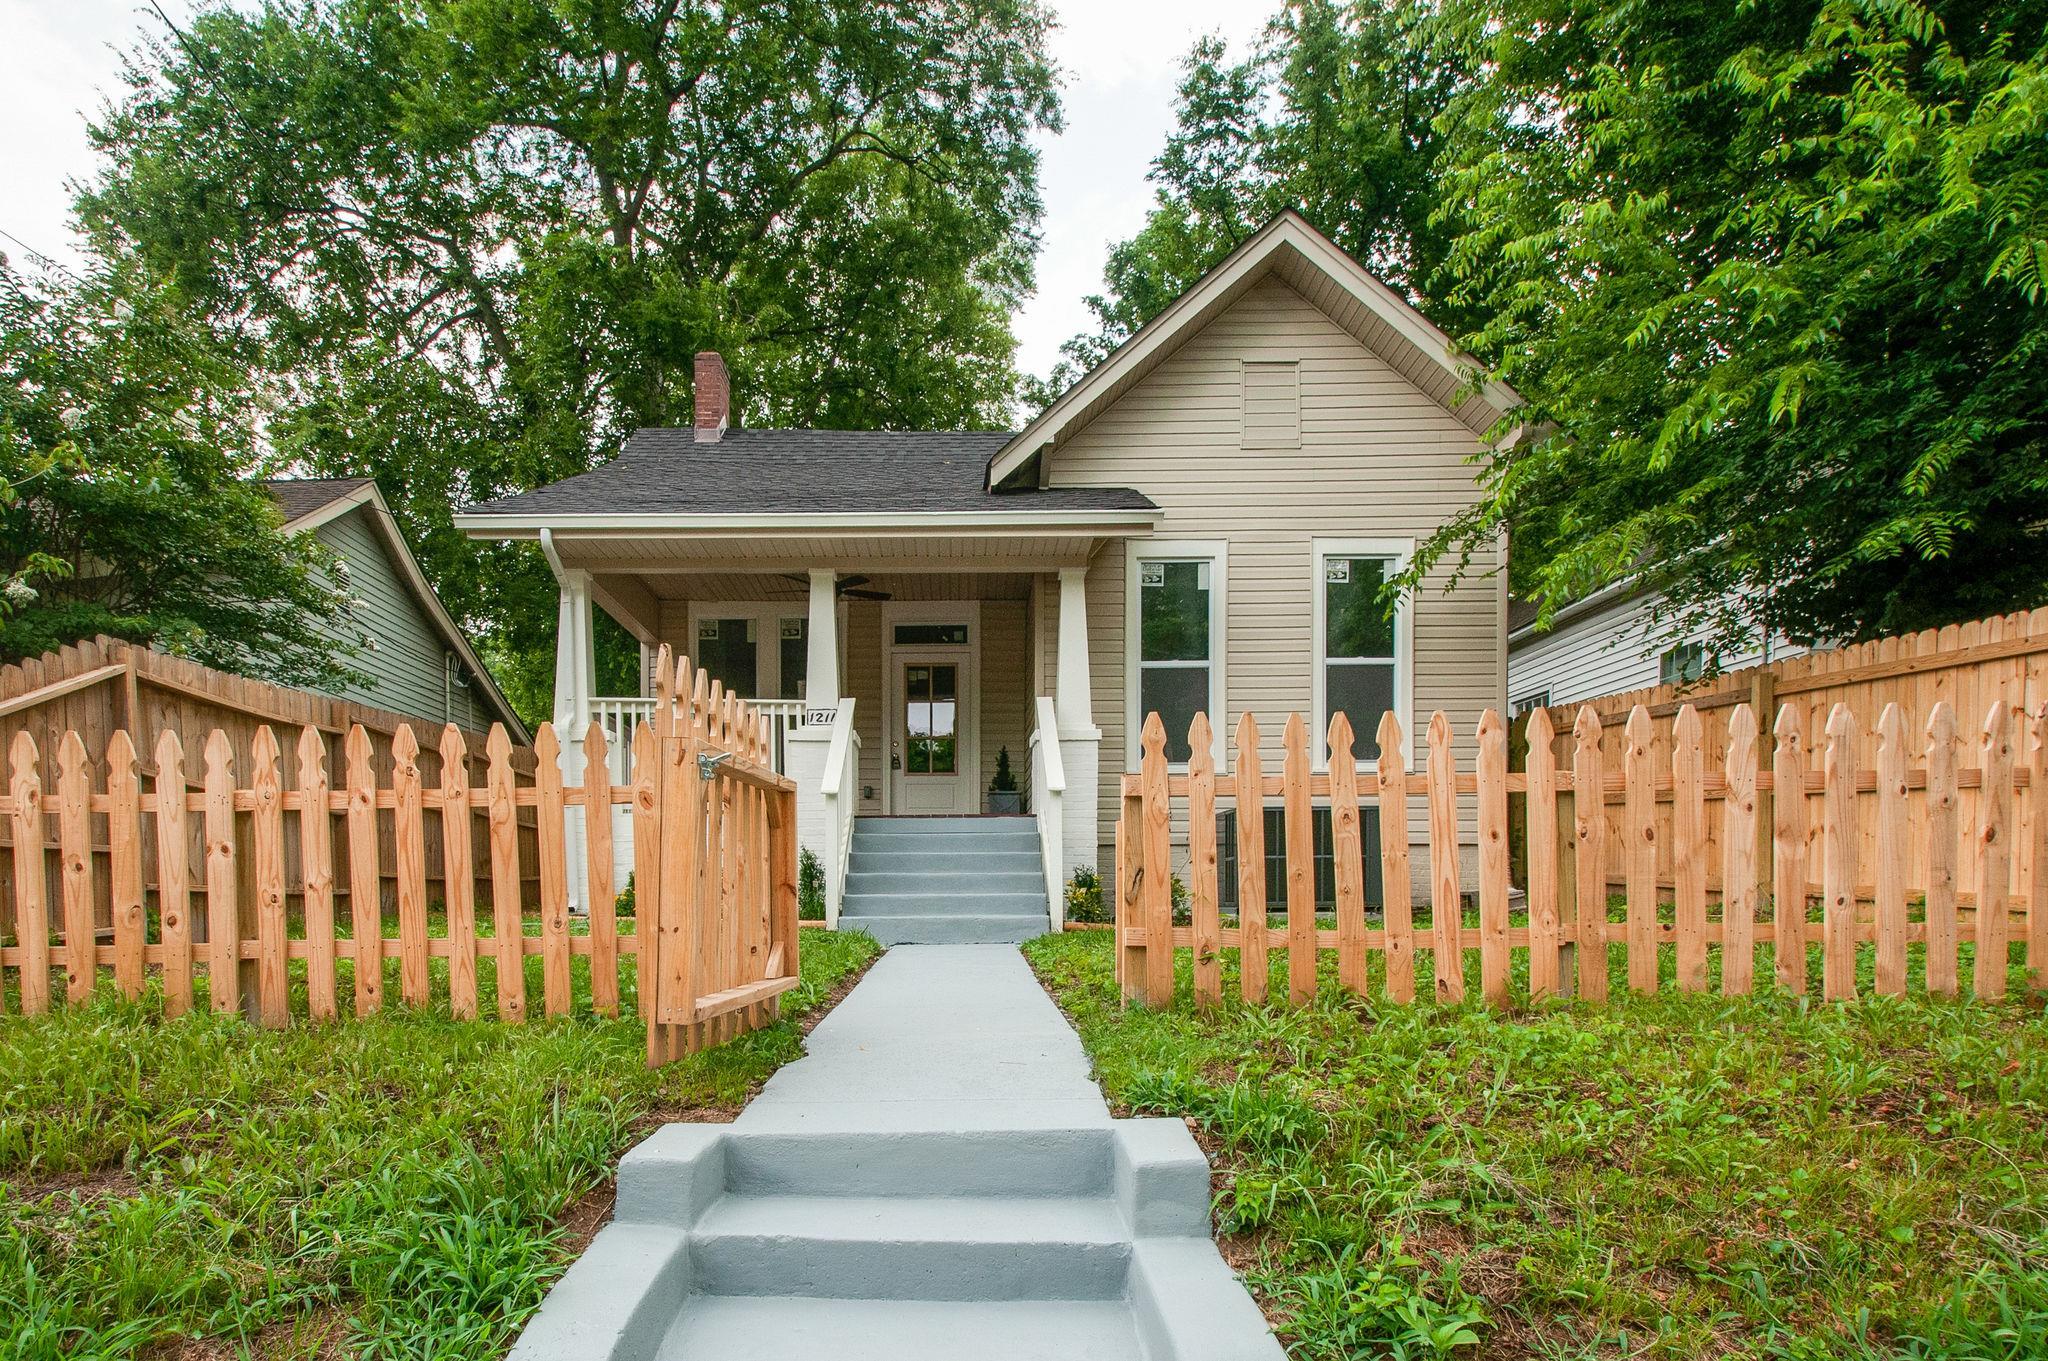 1211 Stainback Ave, Nashville, TN 37207 - Nashville, TN real estate listing